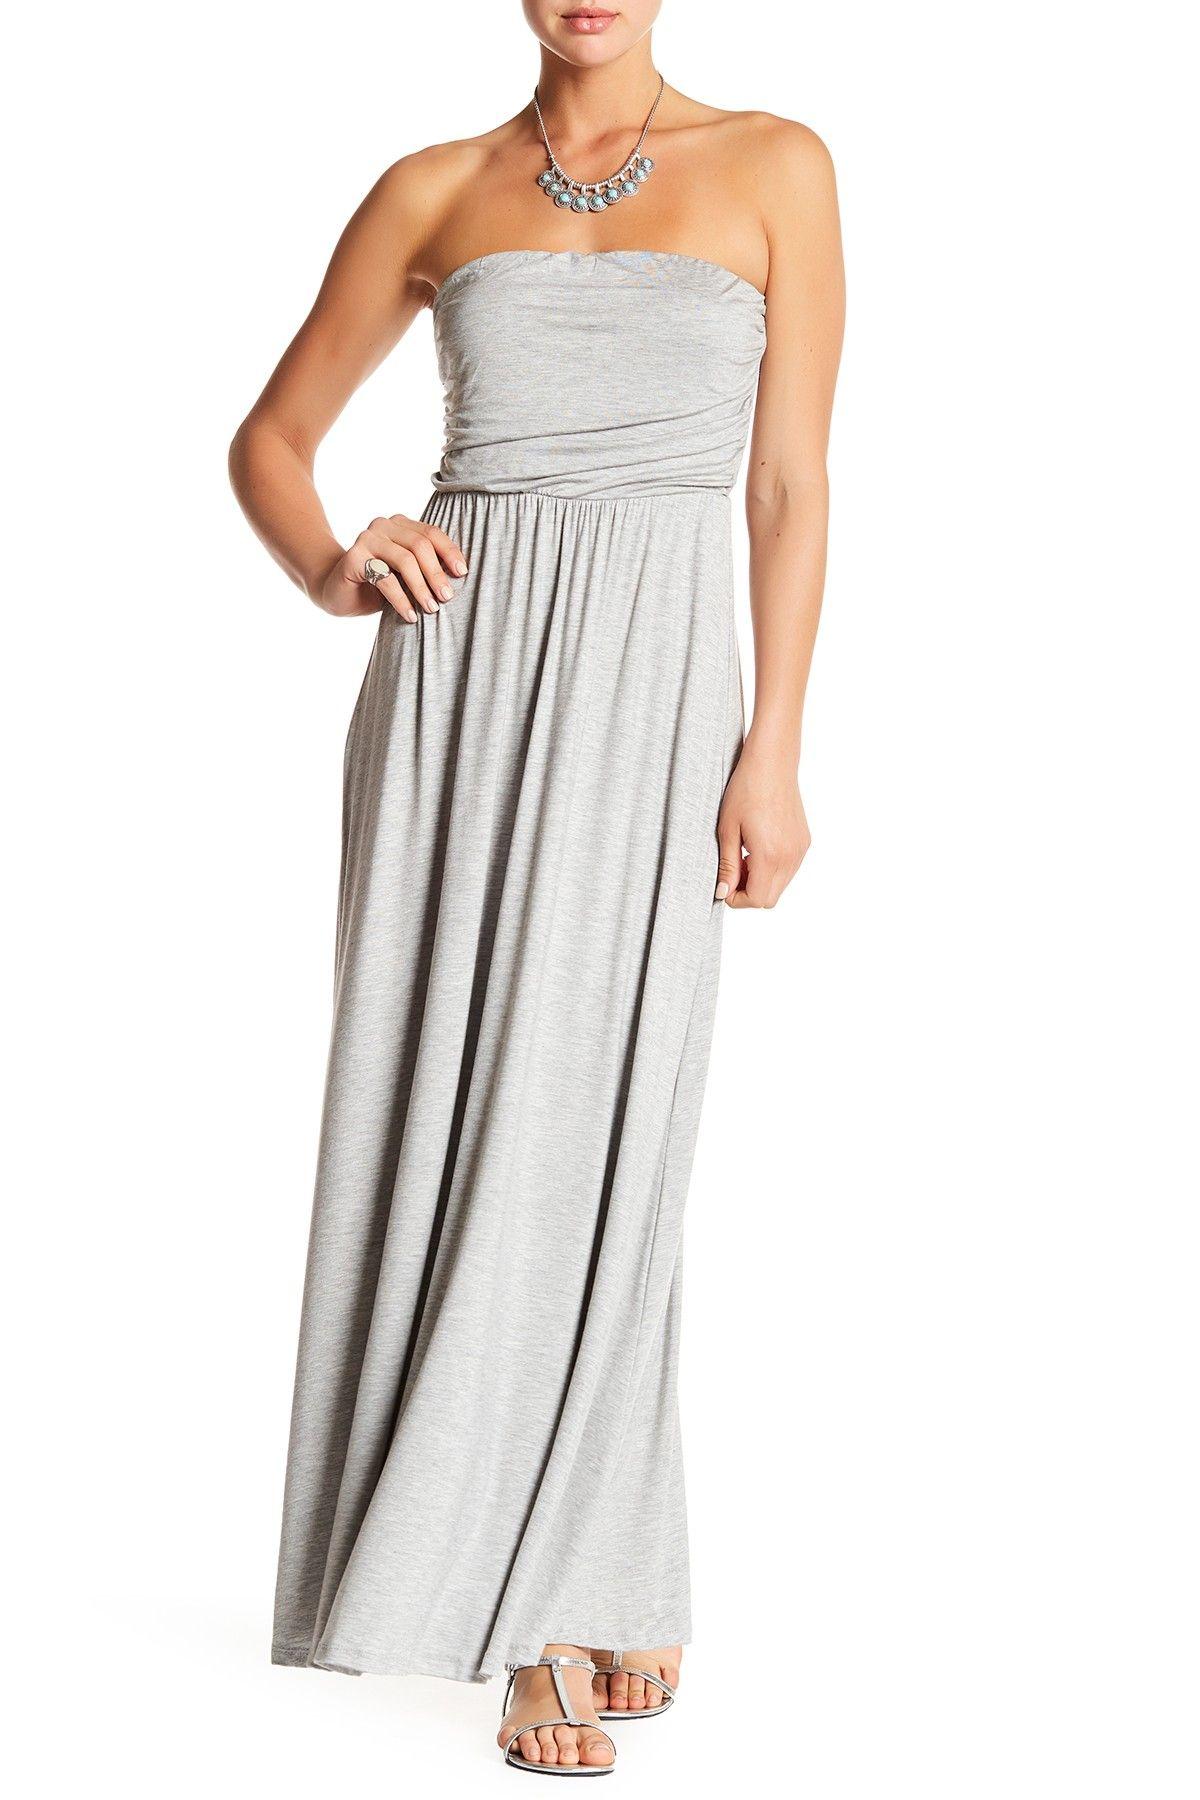 West Kei Strapless Maxi Dress Nordstrom Rack Strapless Maxi Dress Gauze Maxi Dress Maxi Dress [ 1800 x 1200 Pixel ]